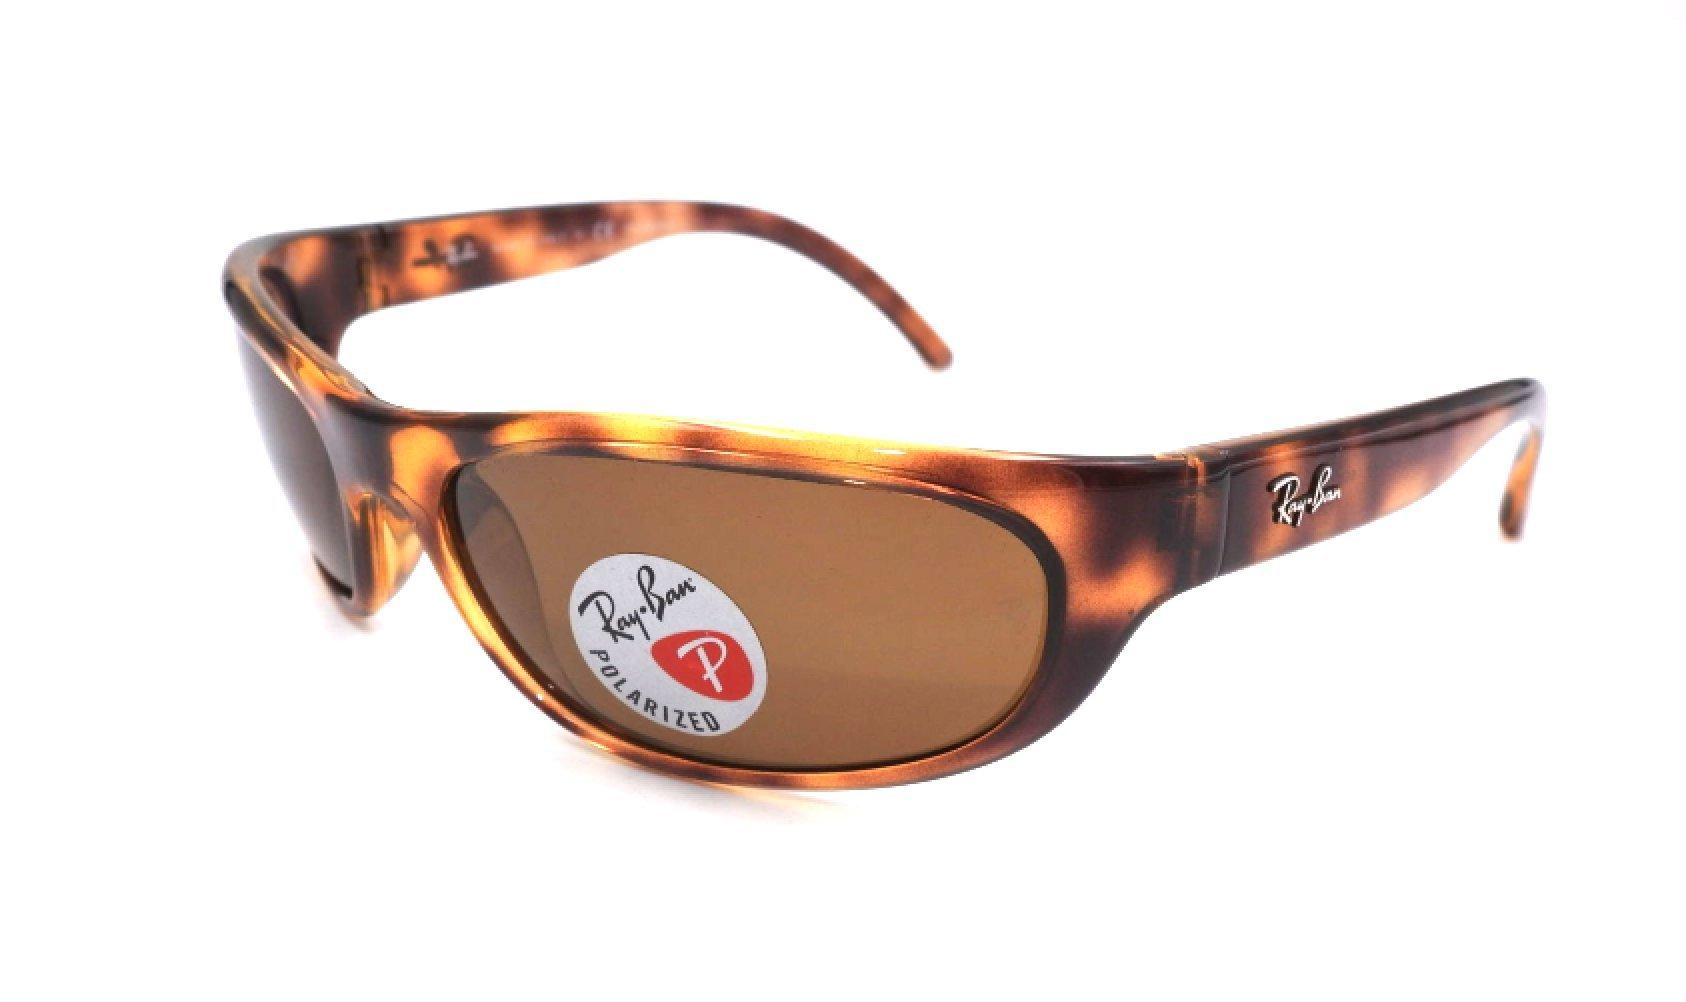 Ray-Ban Men's Rb4033 Polarized Rectangular Sunglasses, Havana, 60.6 mm